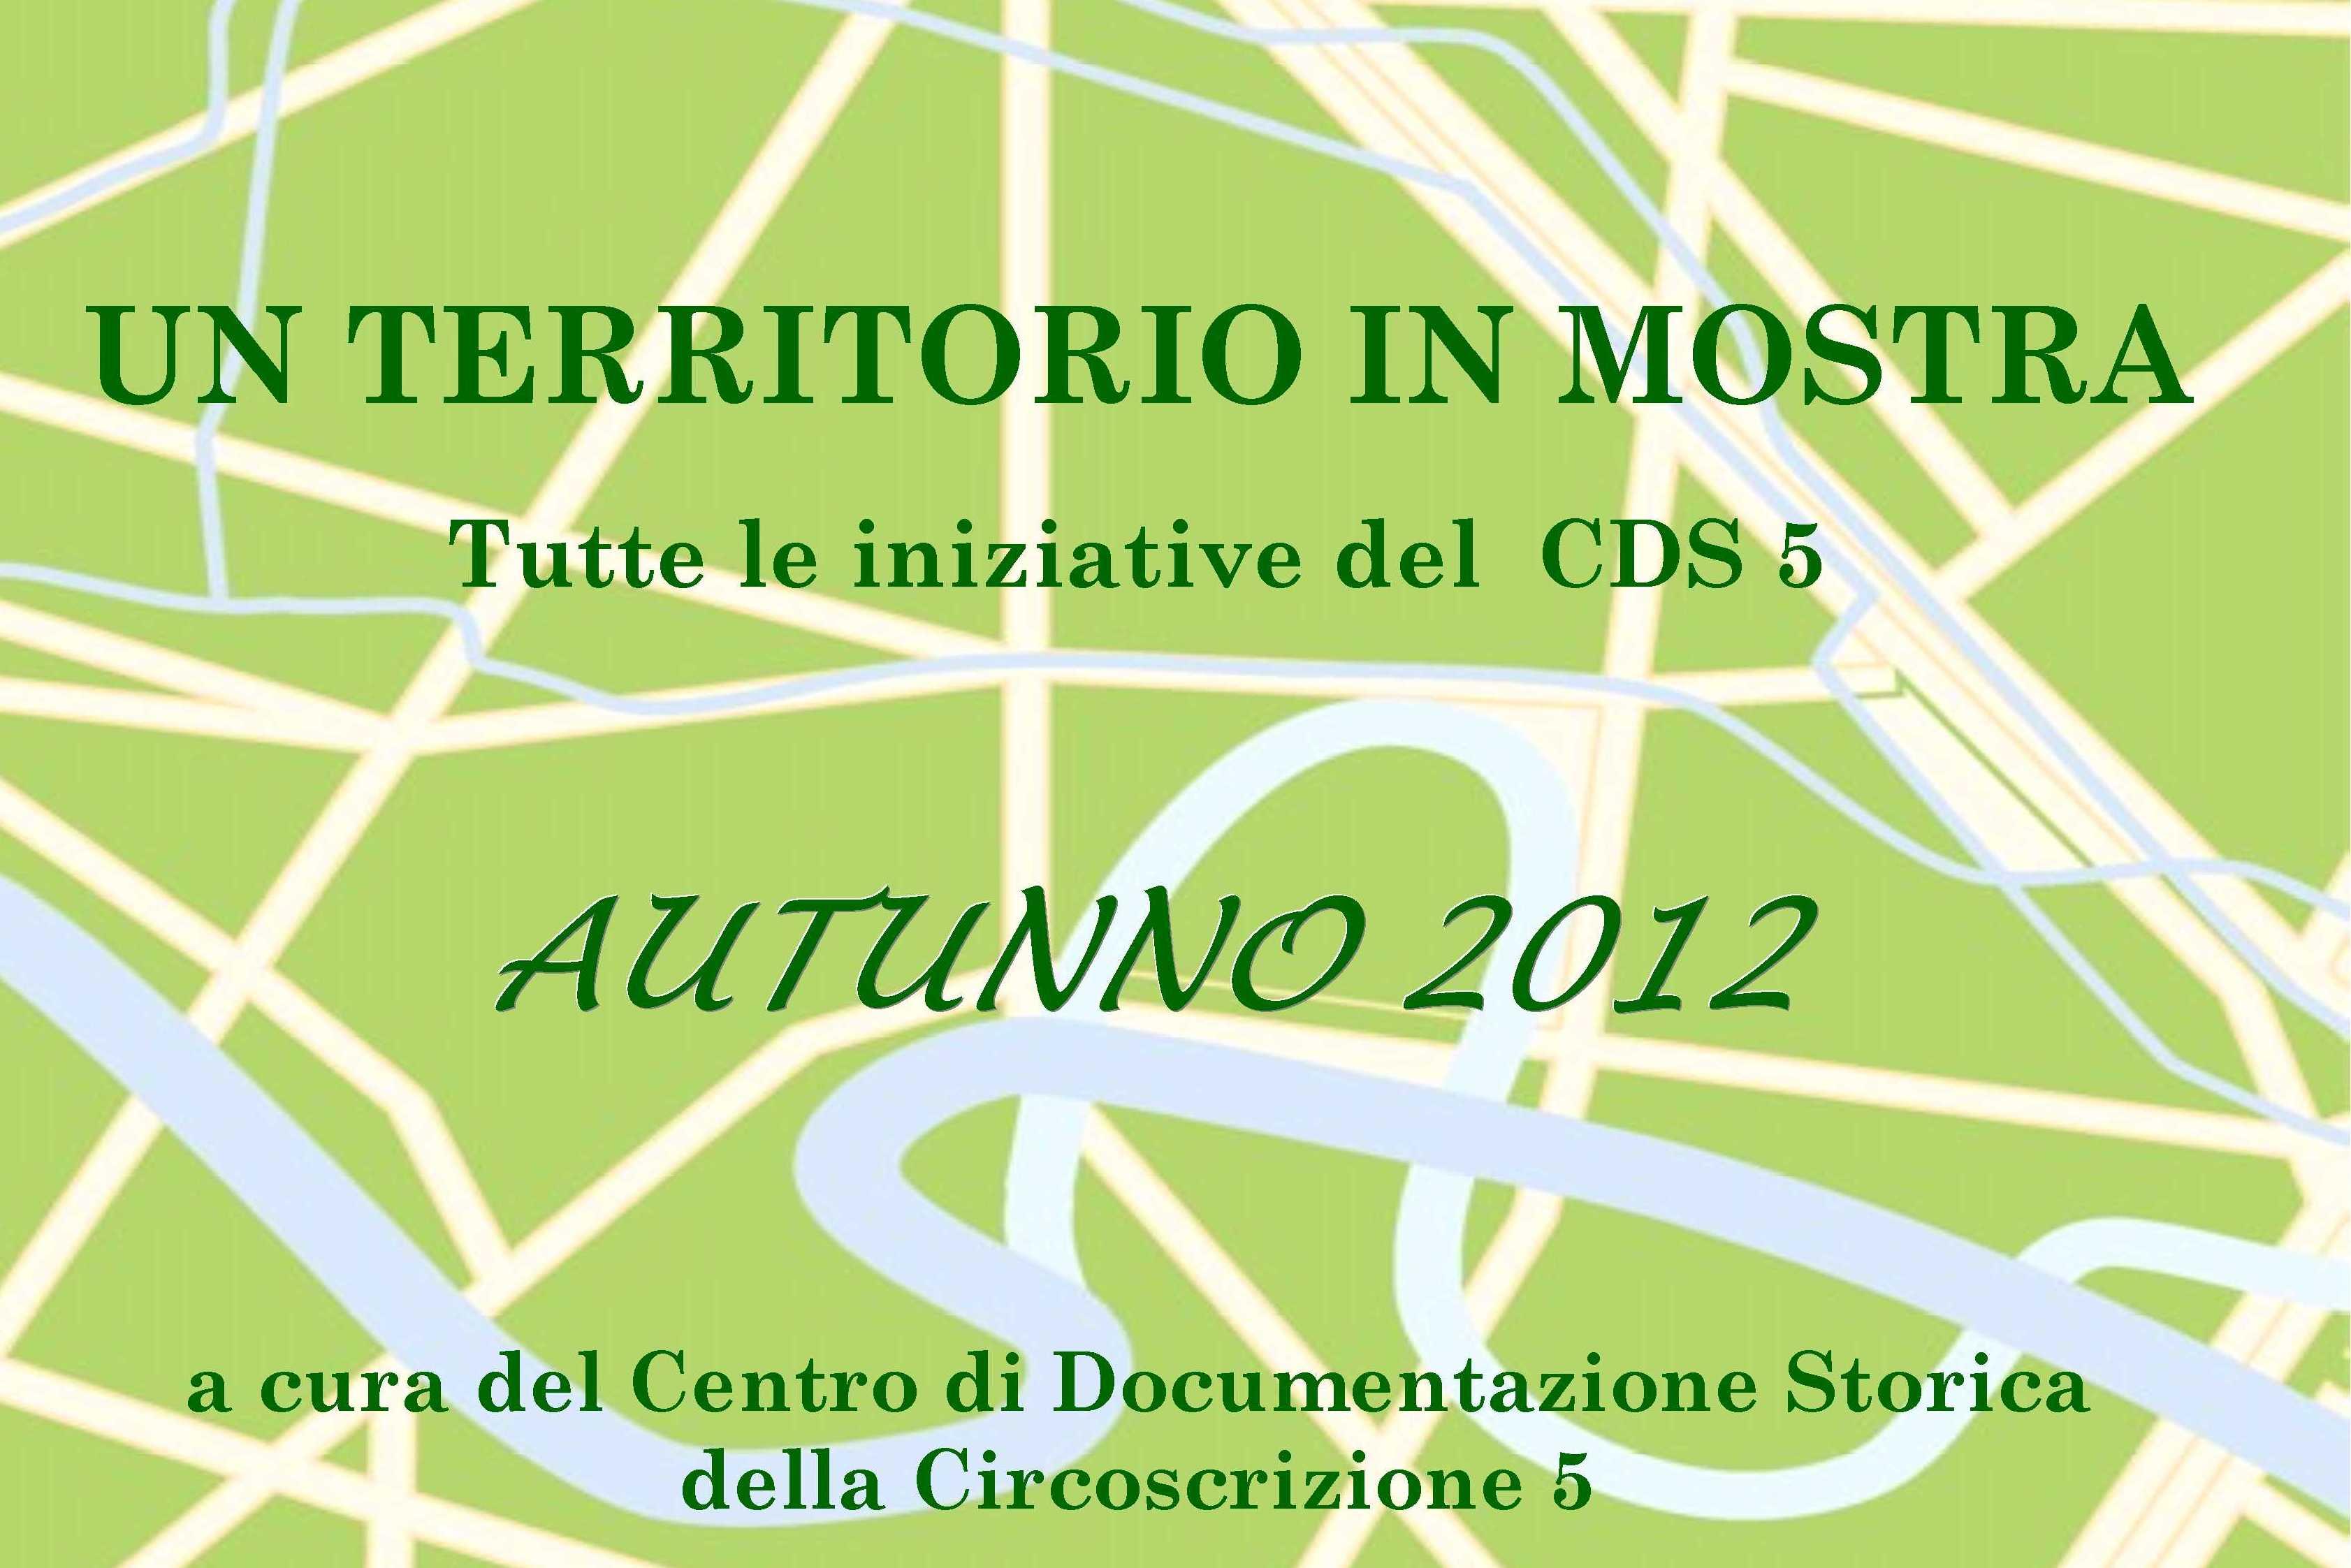 CDS Programma autunno 2012